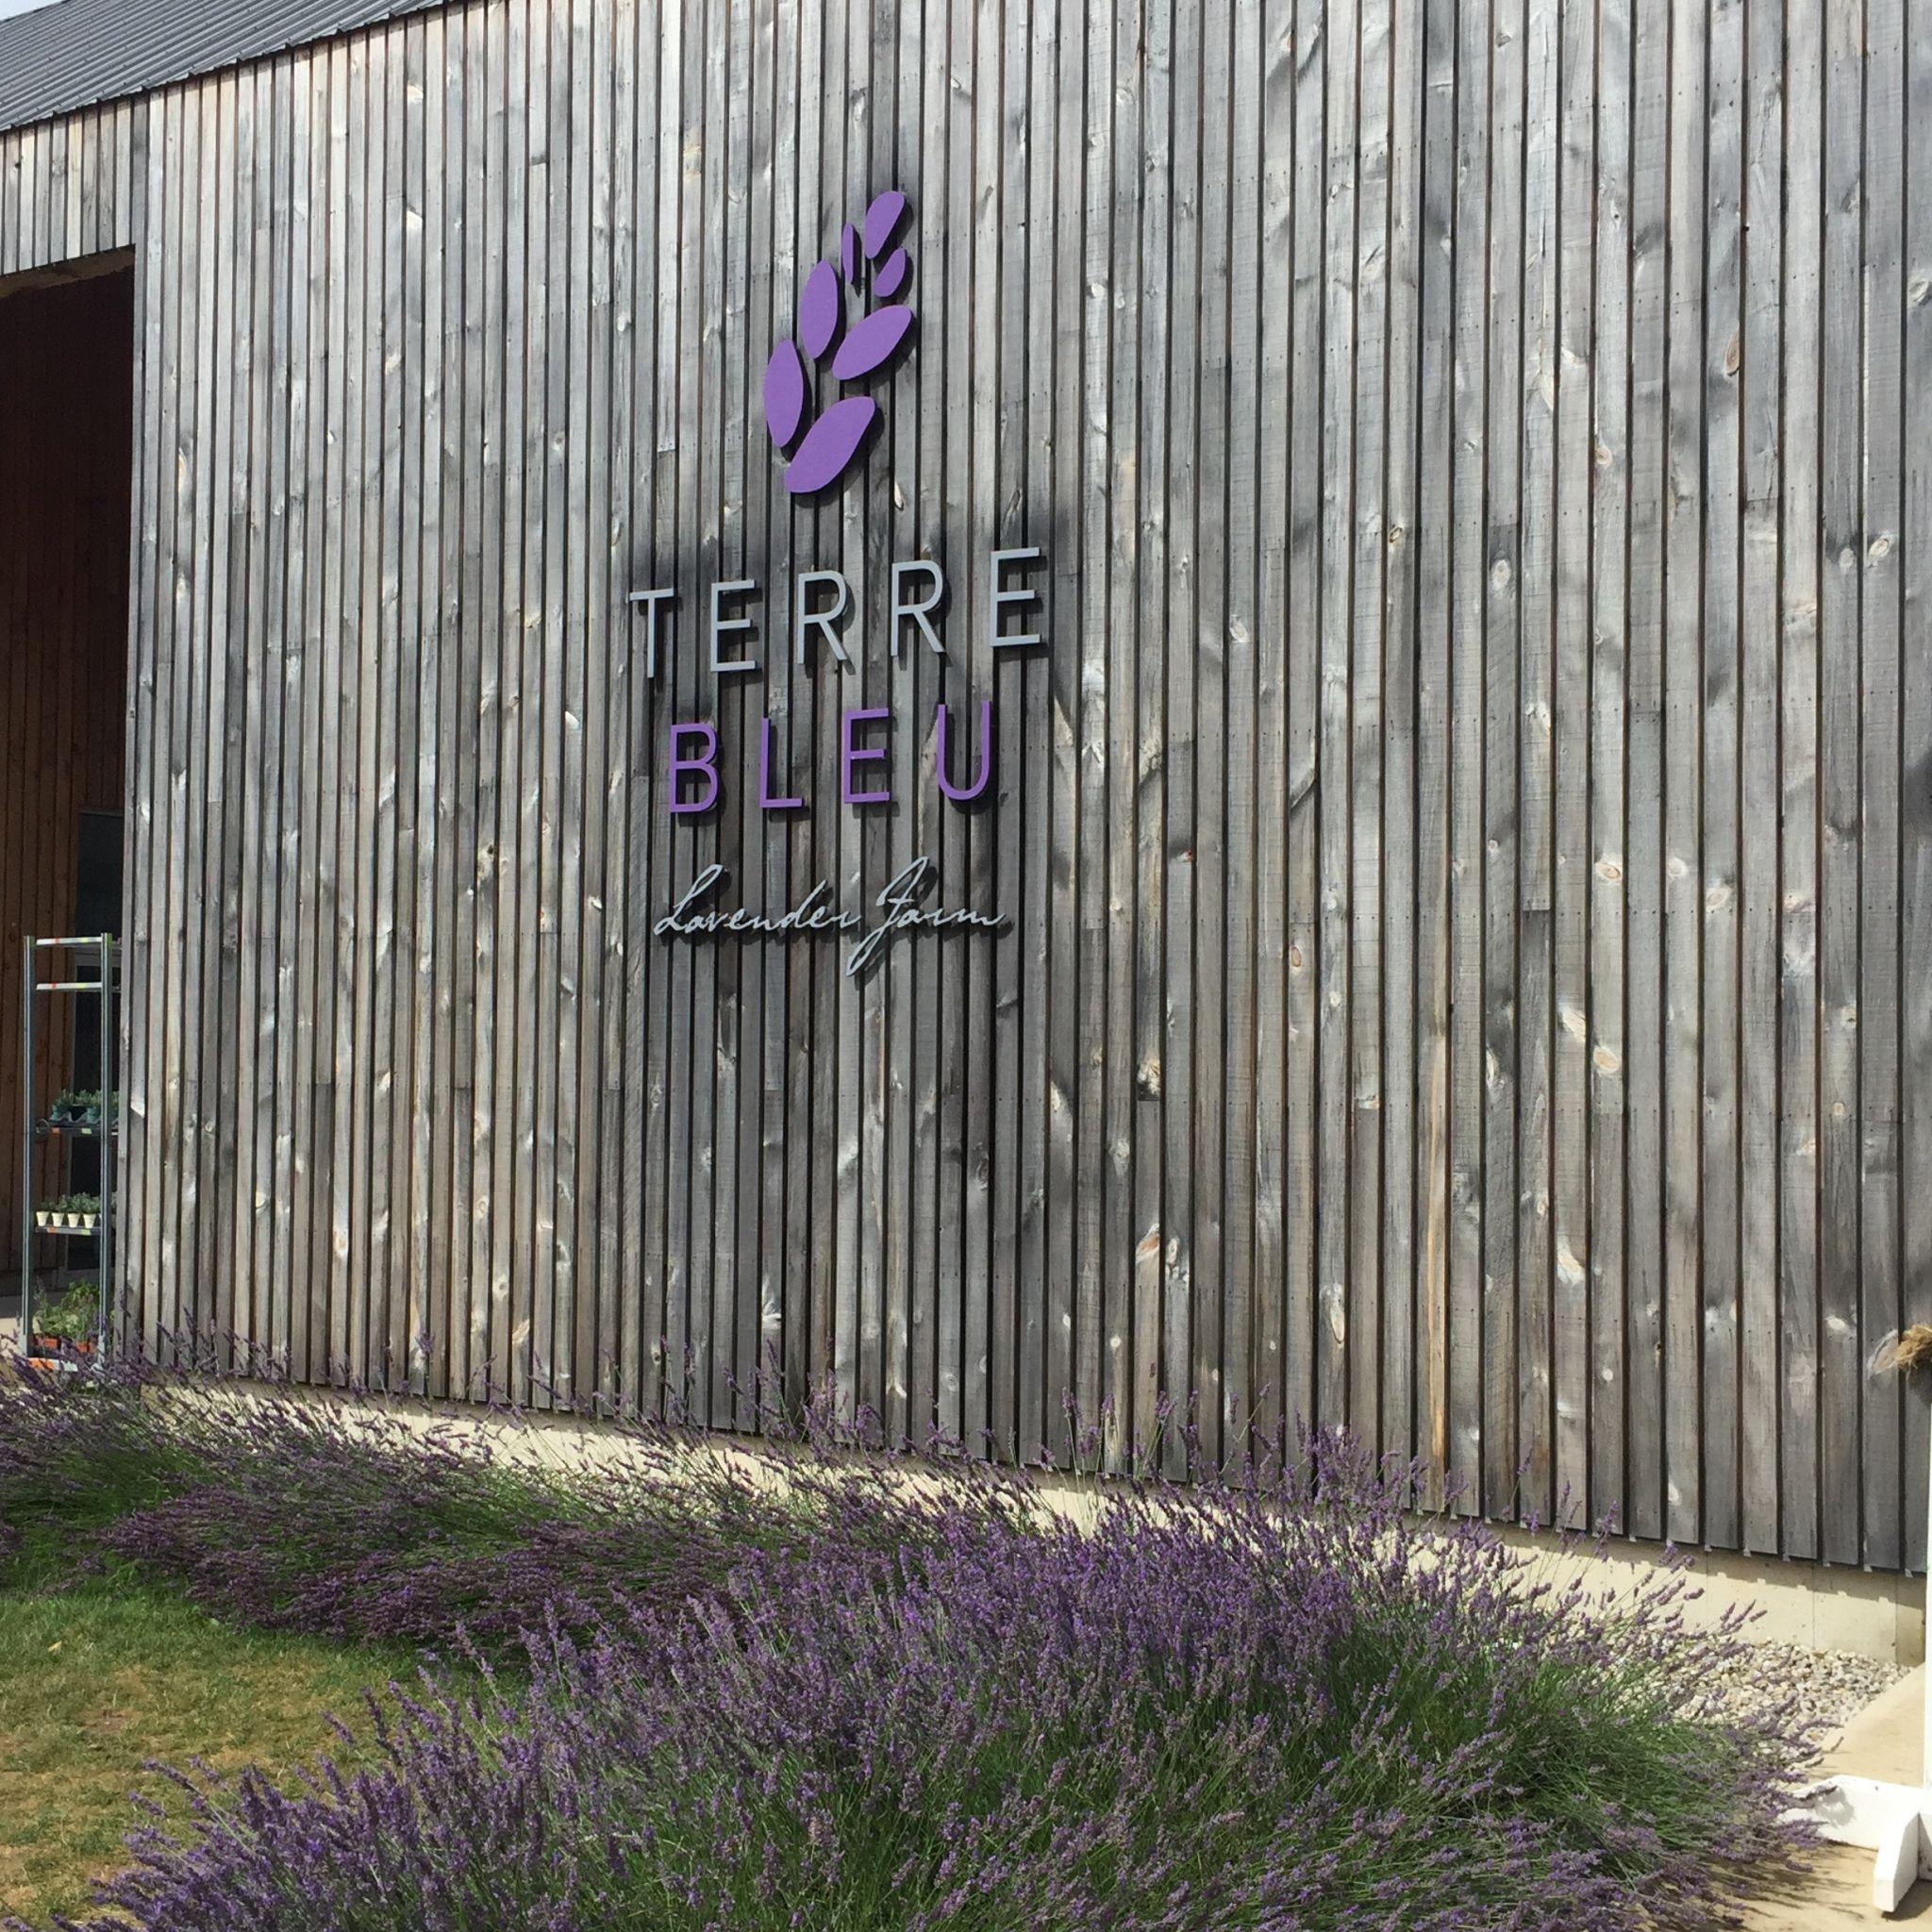 Day Trip: Terre Bleu Lavender Farm - PEACHY VIDA